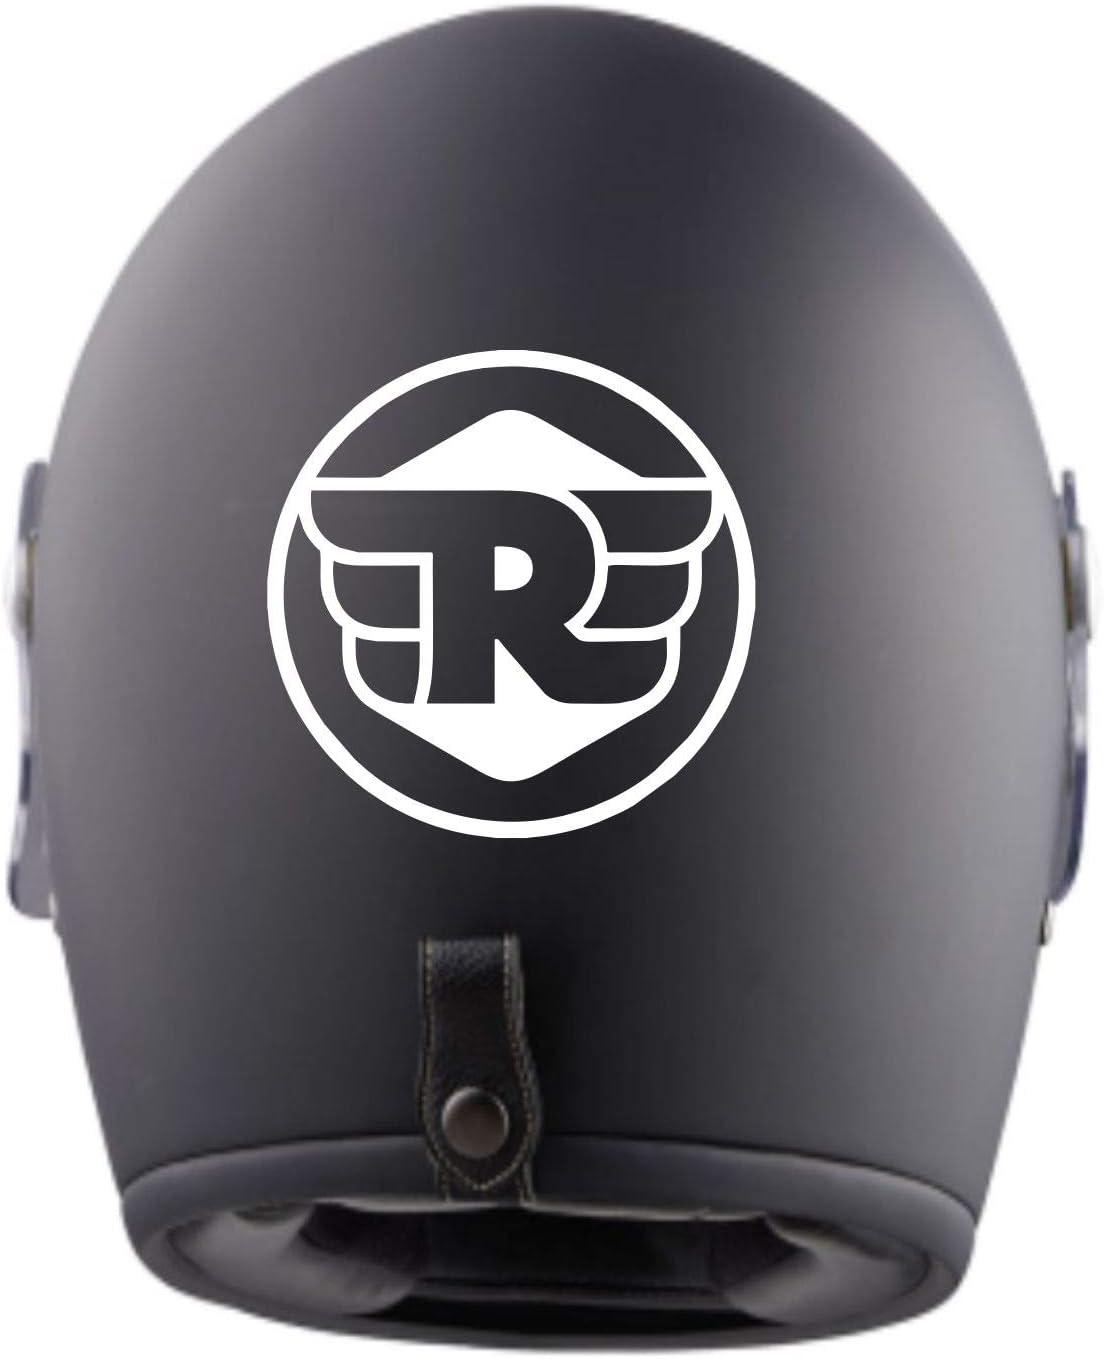 myrockshirt 2X Royal Enfield Logo Logo Helmaufkleber Aufkleber f/ür Motorrad Bike Roller Mofa Sticker Decal Tuningaufkleber